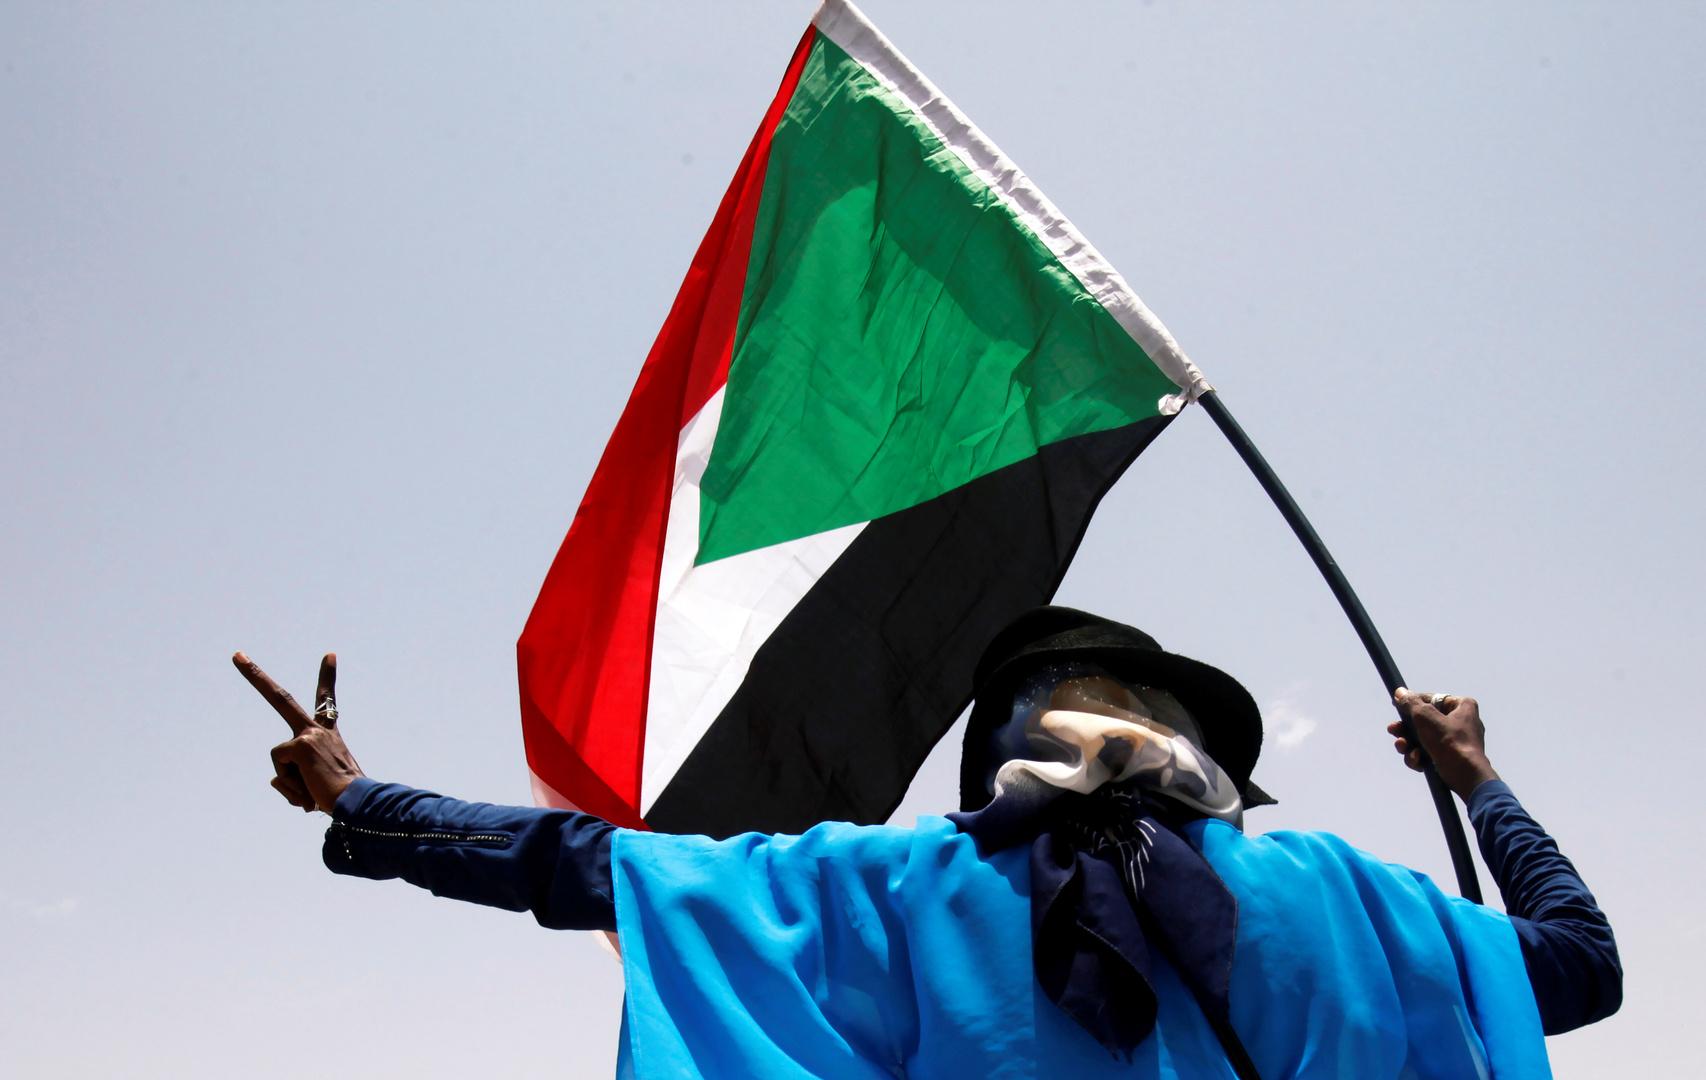 مواطن سوداني يرفع علم السودان